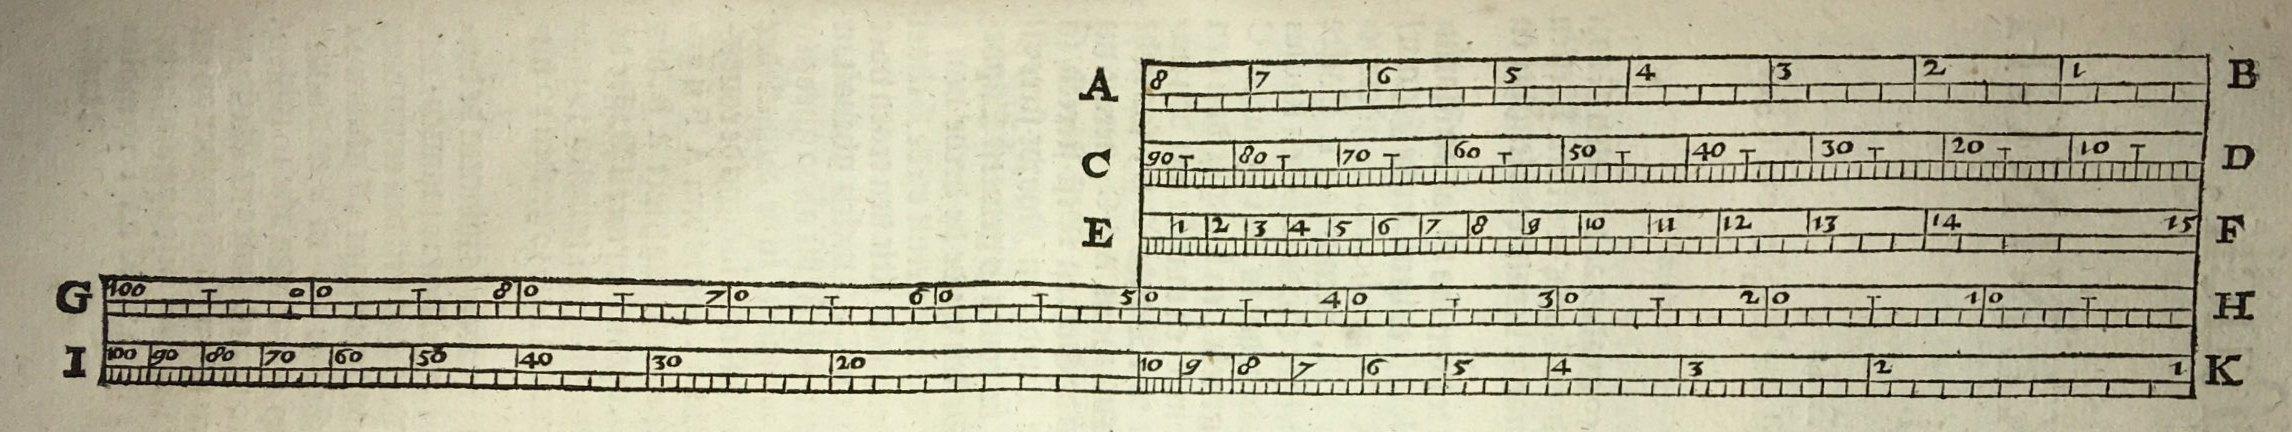 Pleinschaal Abraham de Graef